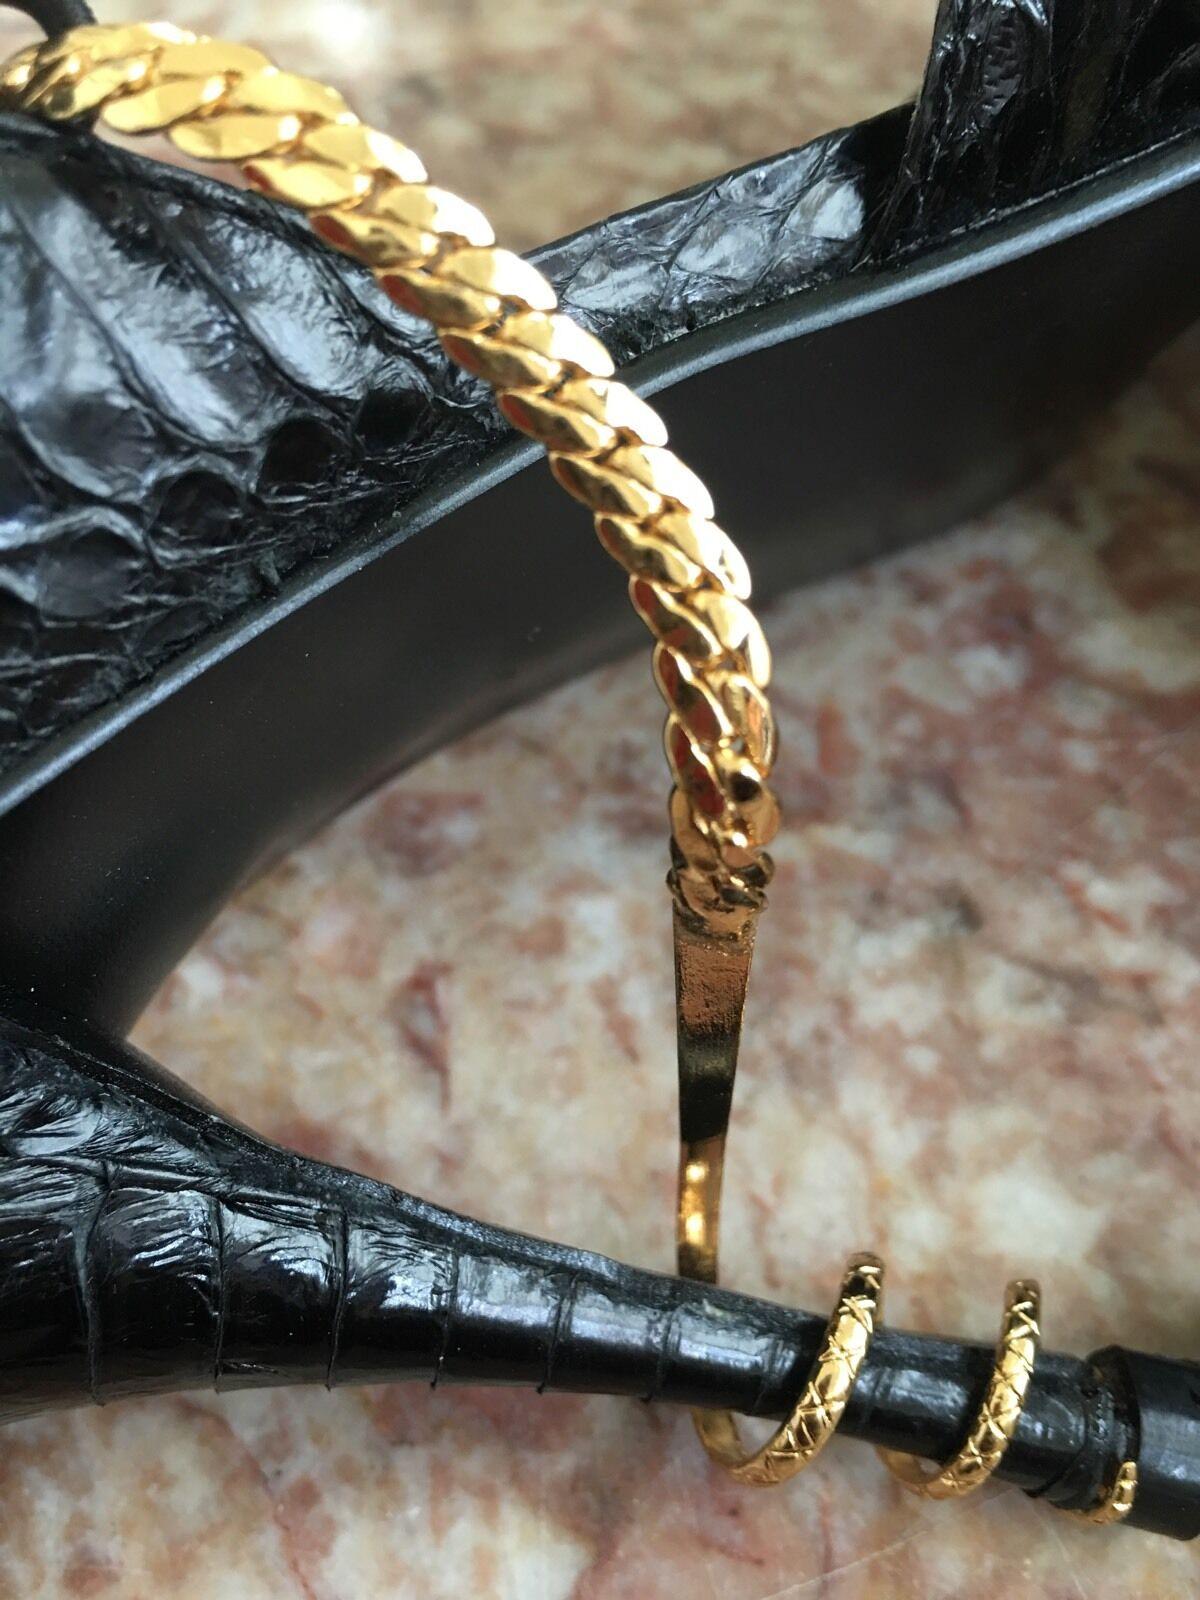 NEW NEW NEW COLIN STUART GENUINE SNAKESKIN Gold SNAKE CHAIN STILETTO HEEL PUMPS Größe 7 9b59f2